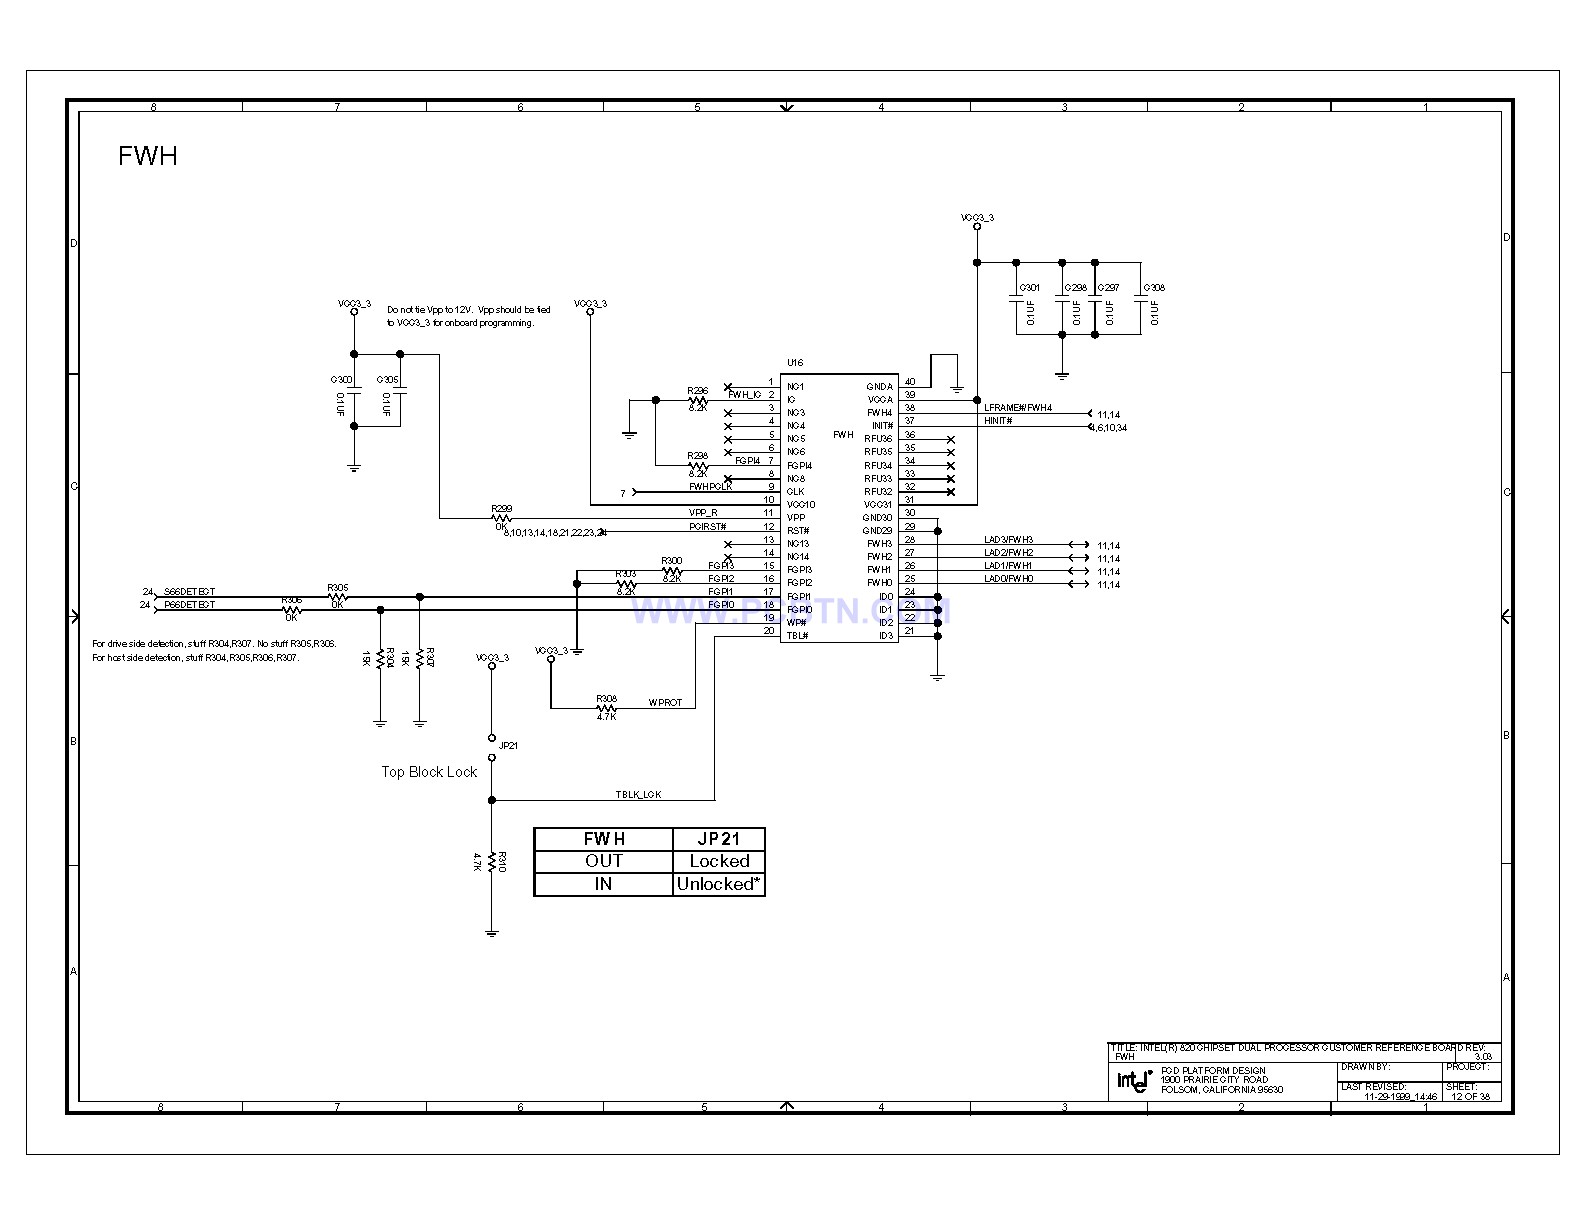 Intel 820e主板FWH电路图